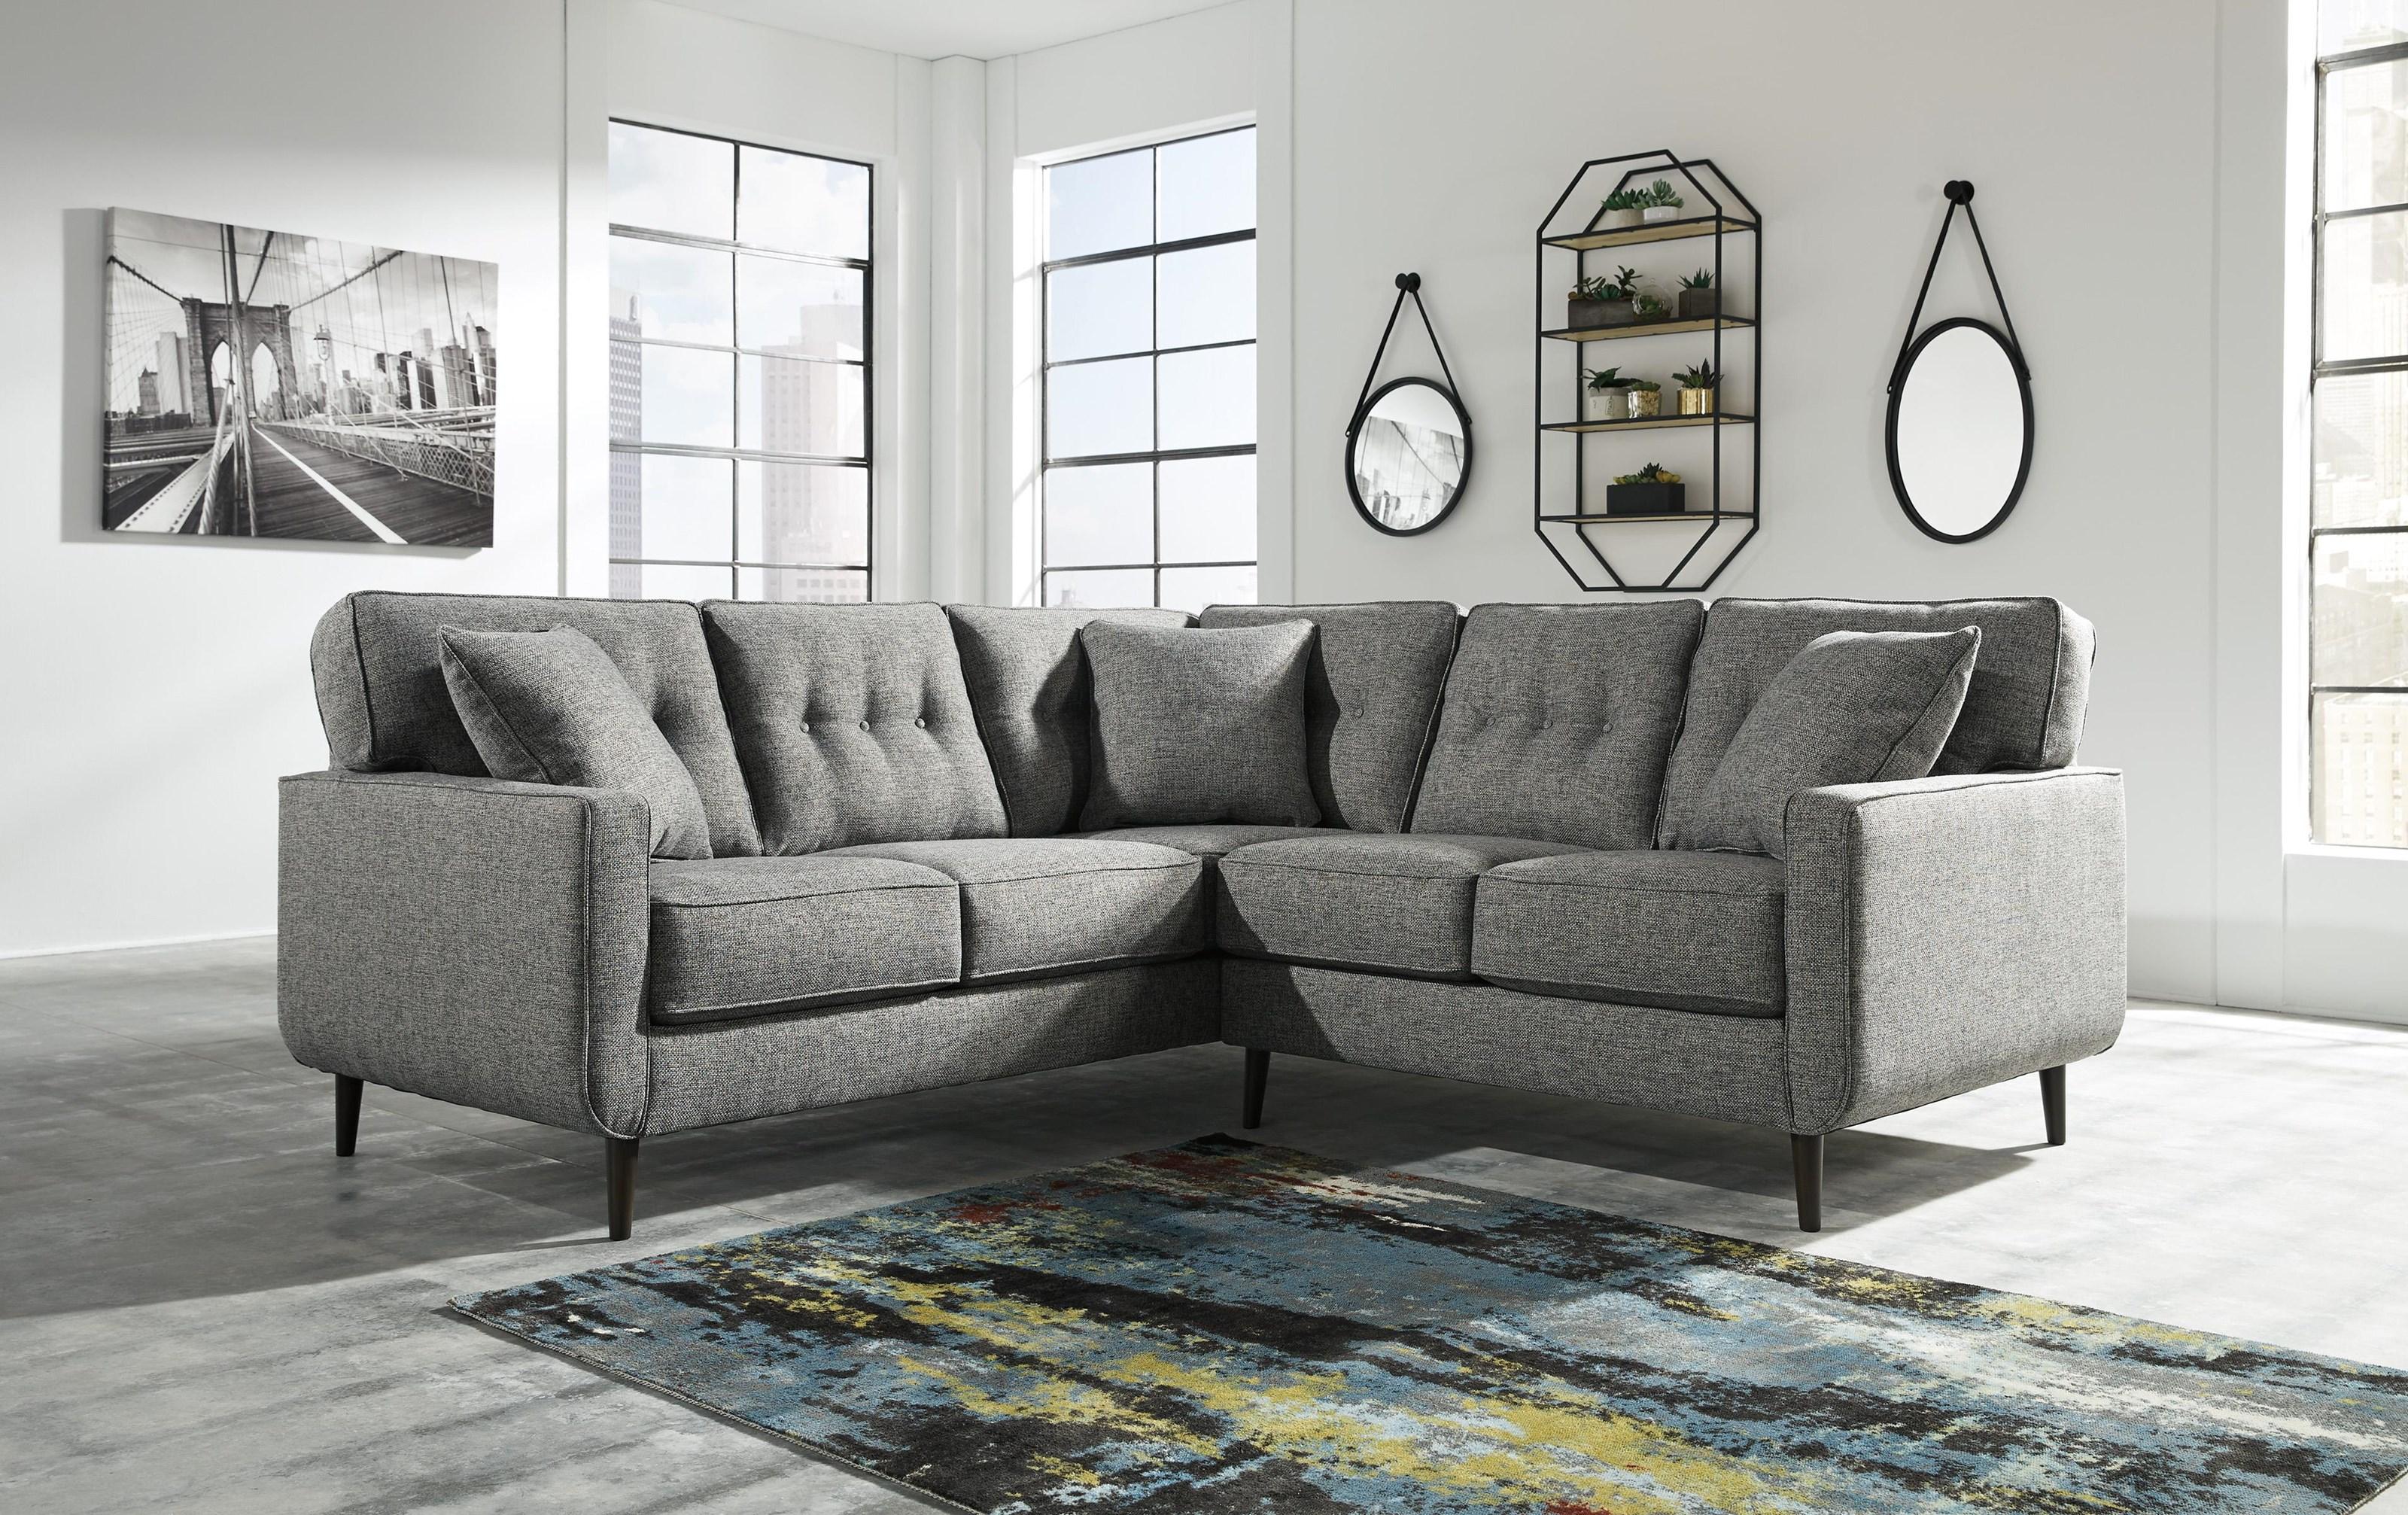 Ashley Furniture Zardoni 11402 48 56 2 Piece Sectional With Left Arm